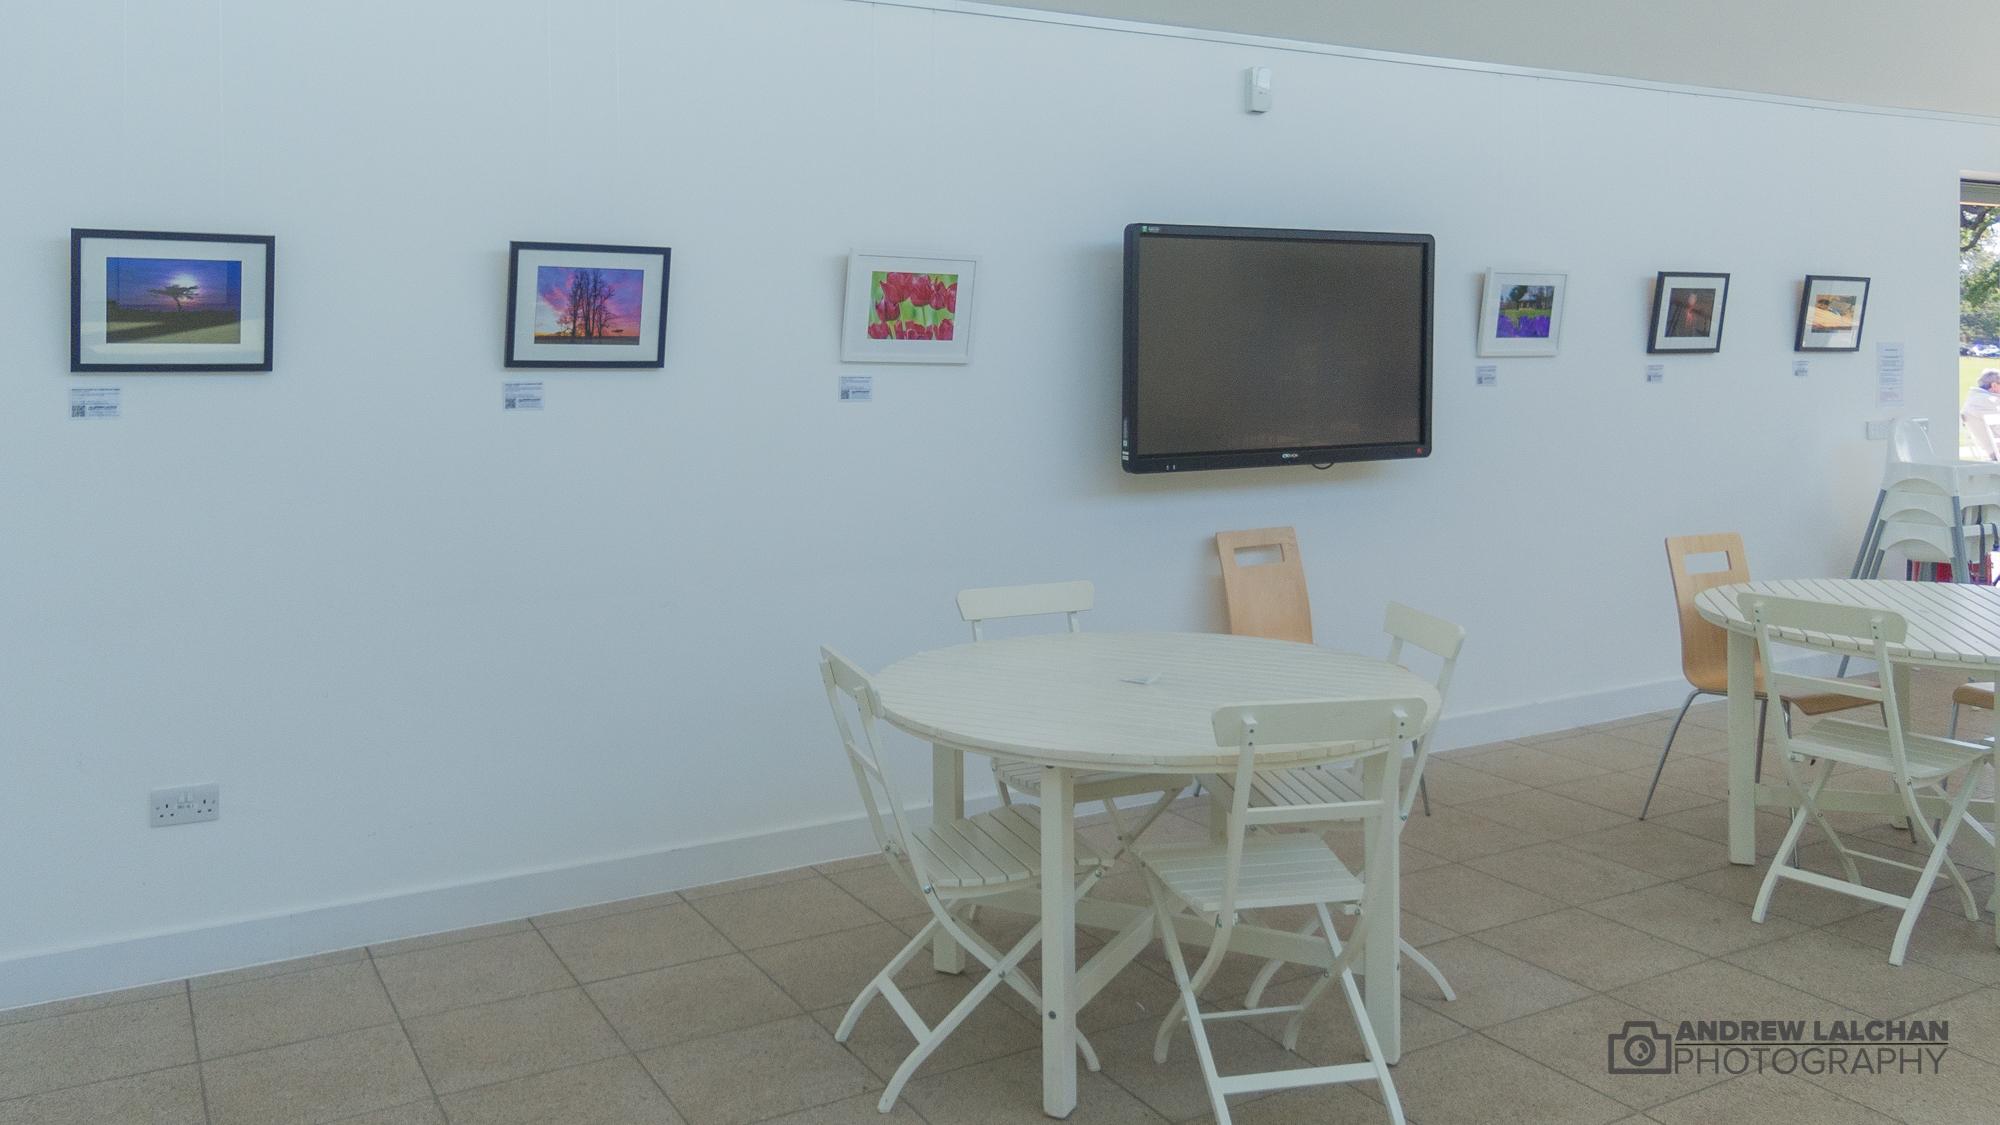 Cassiobury Park Hub exhibition